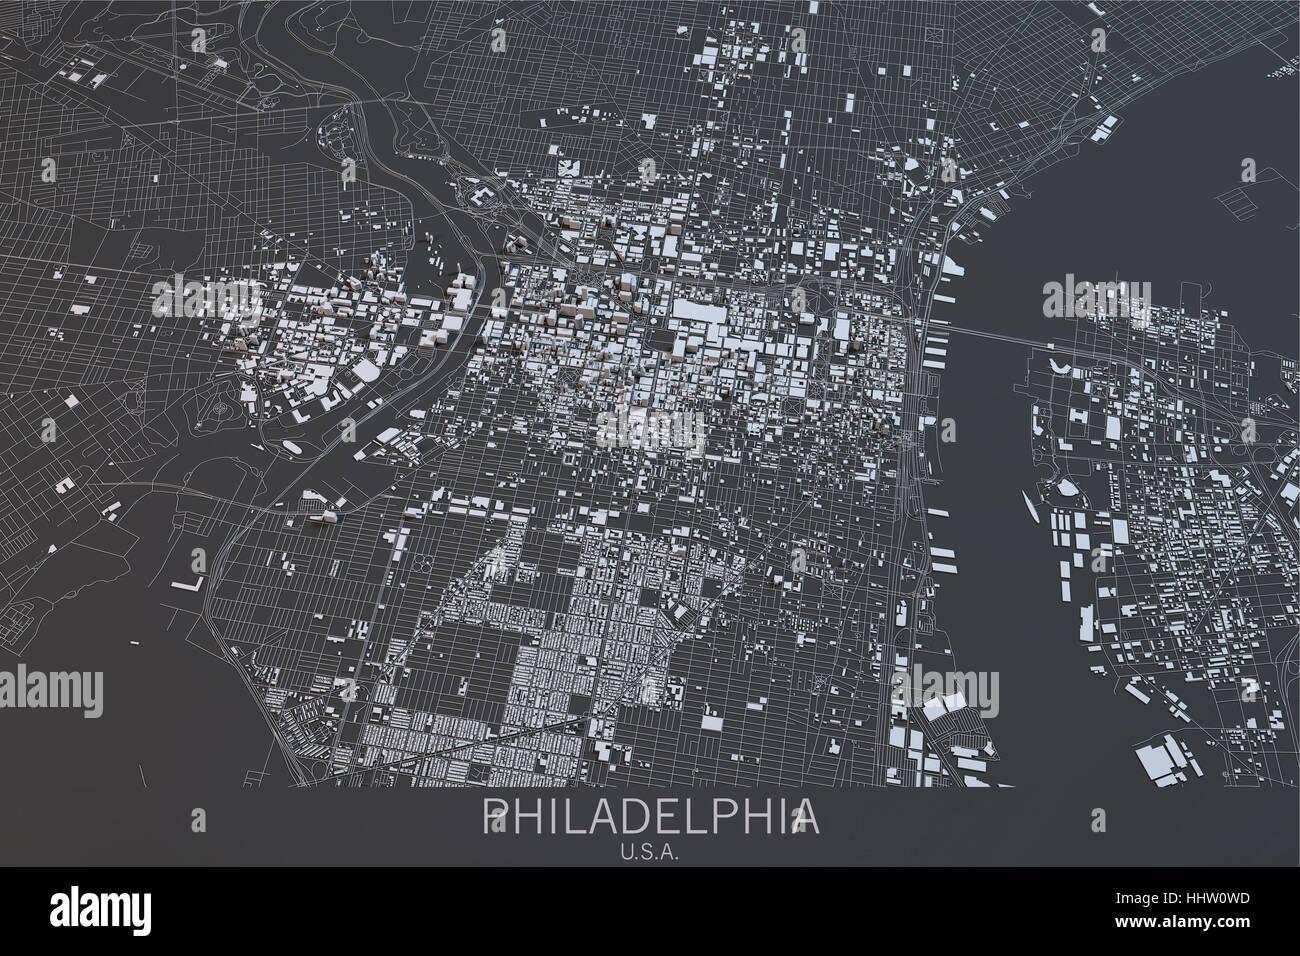 USA Map Google Maps United States Satellite Diagram Get Free - Chicago map satellite